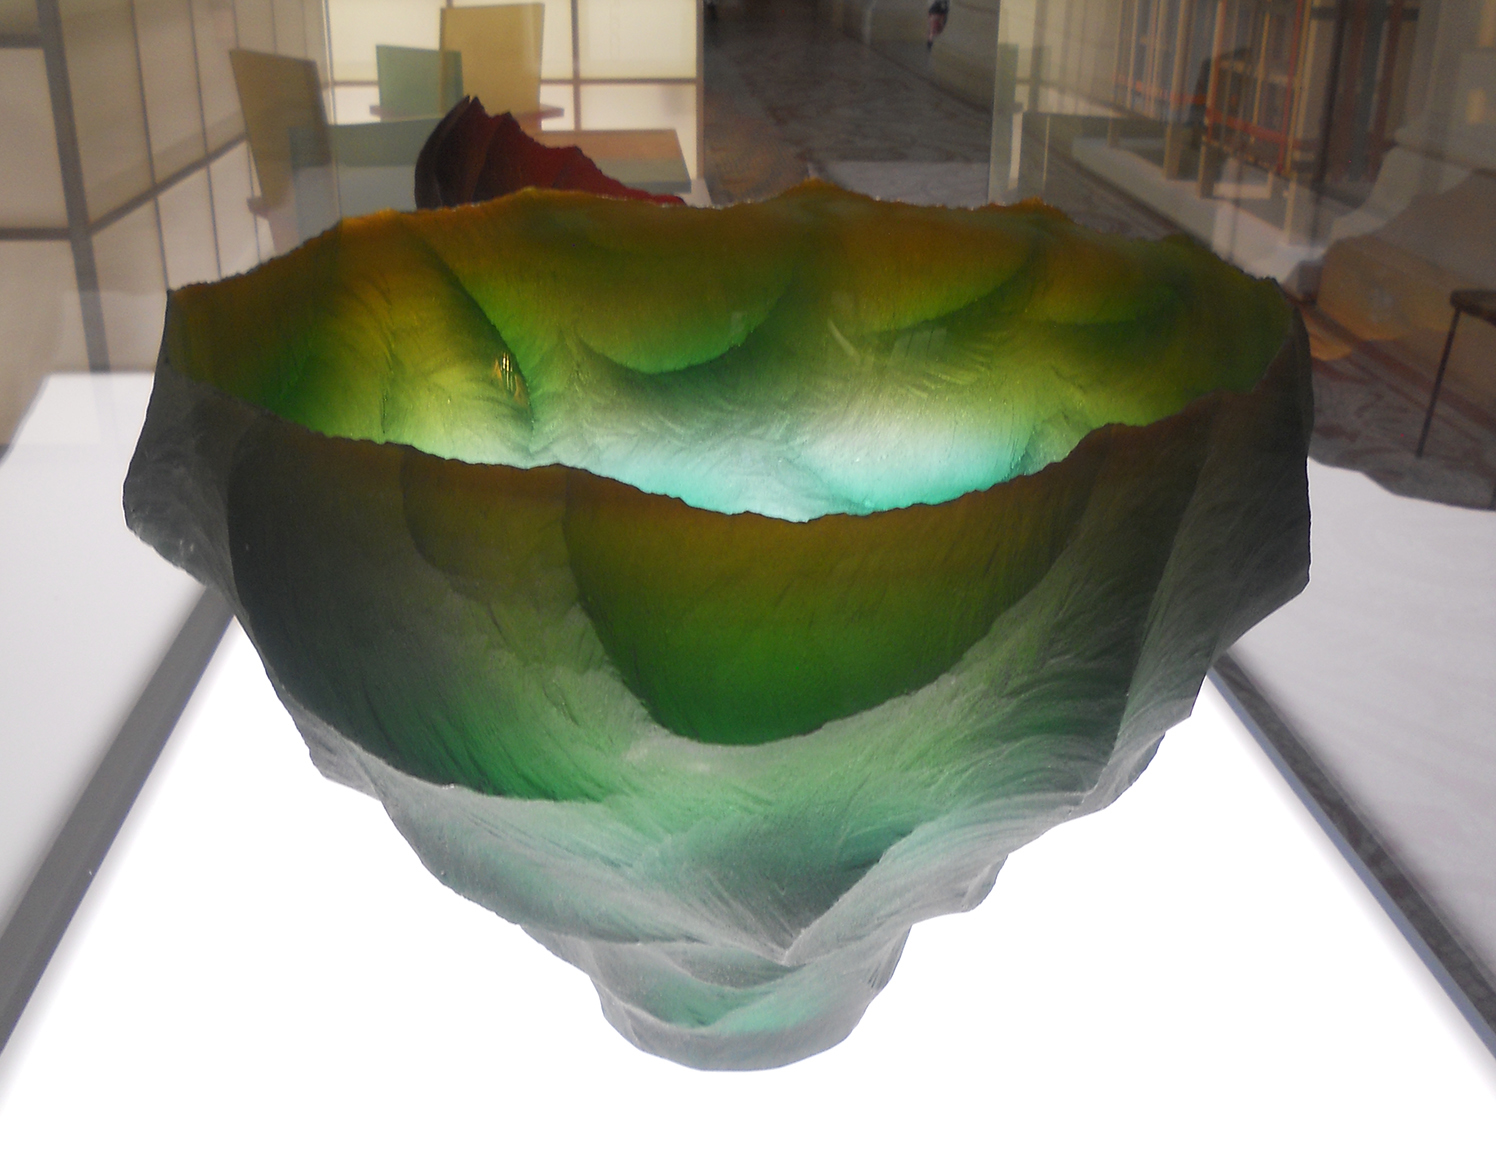 Glass Vessel by Kim Joon-yong